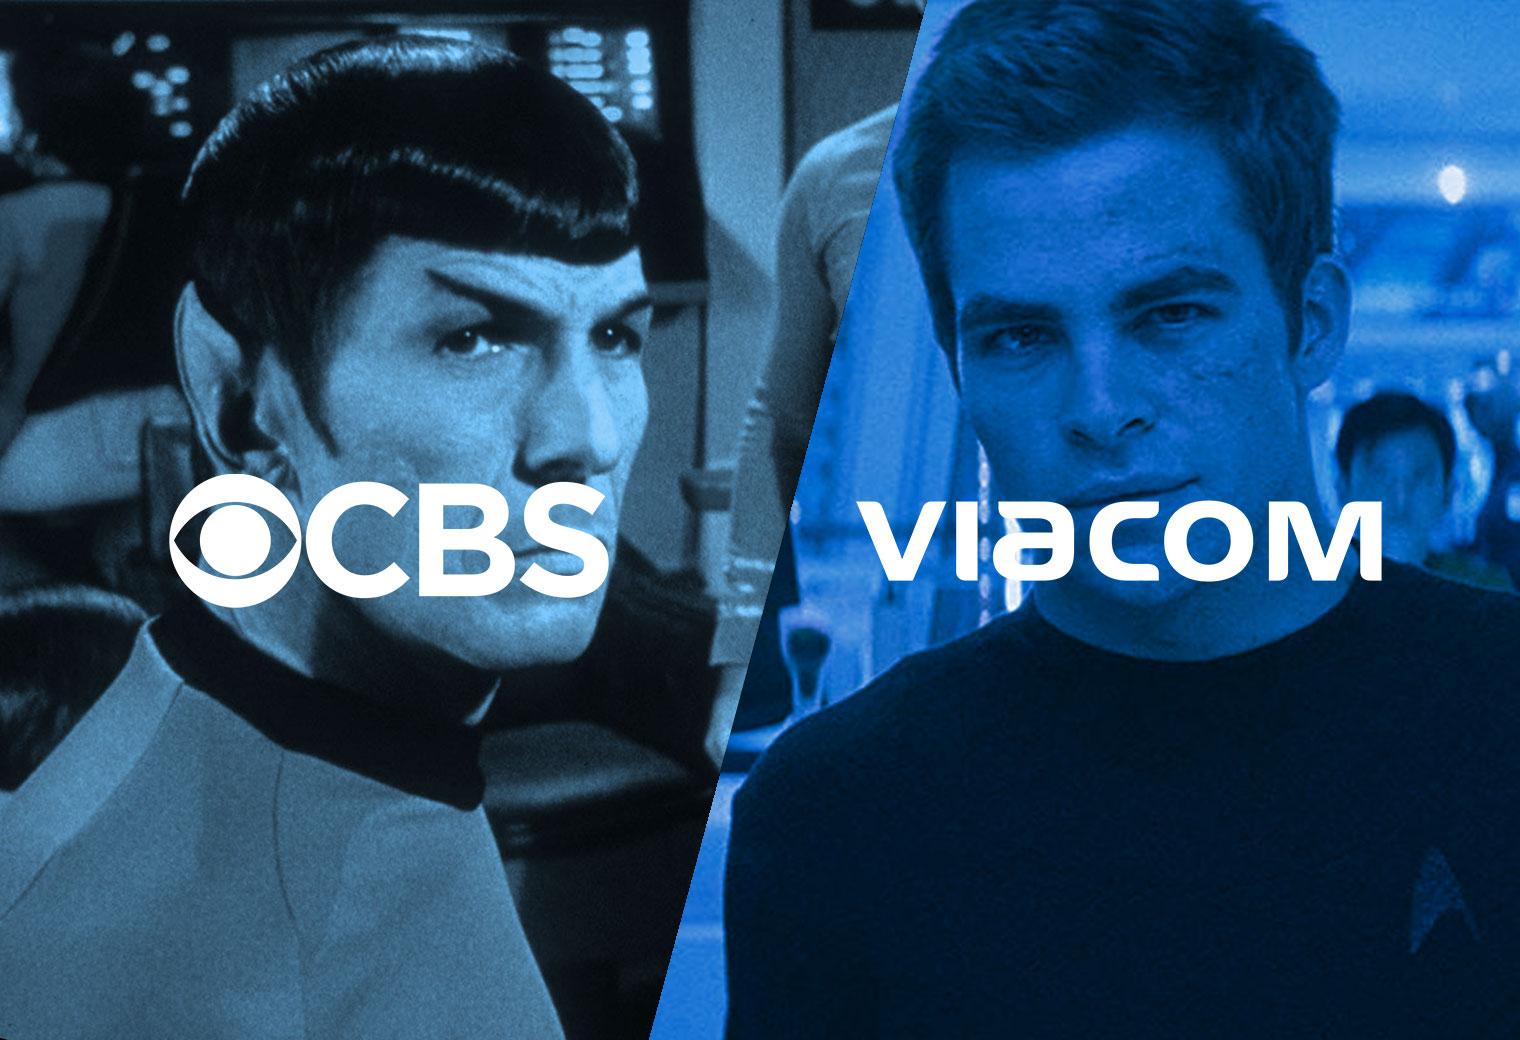 CBS-Viacom Reunification Expected Soon